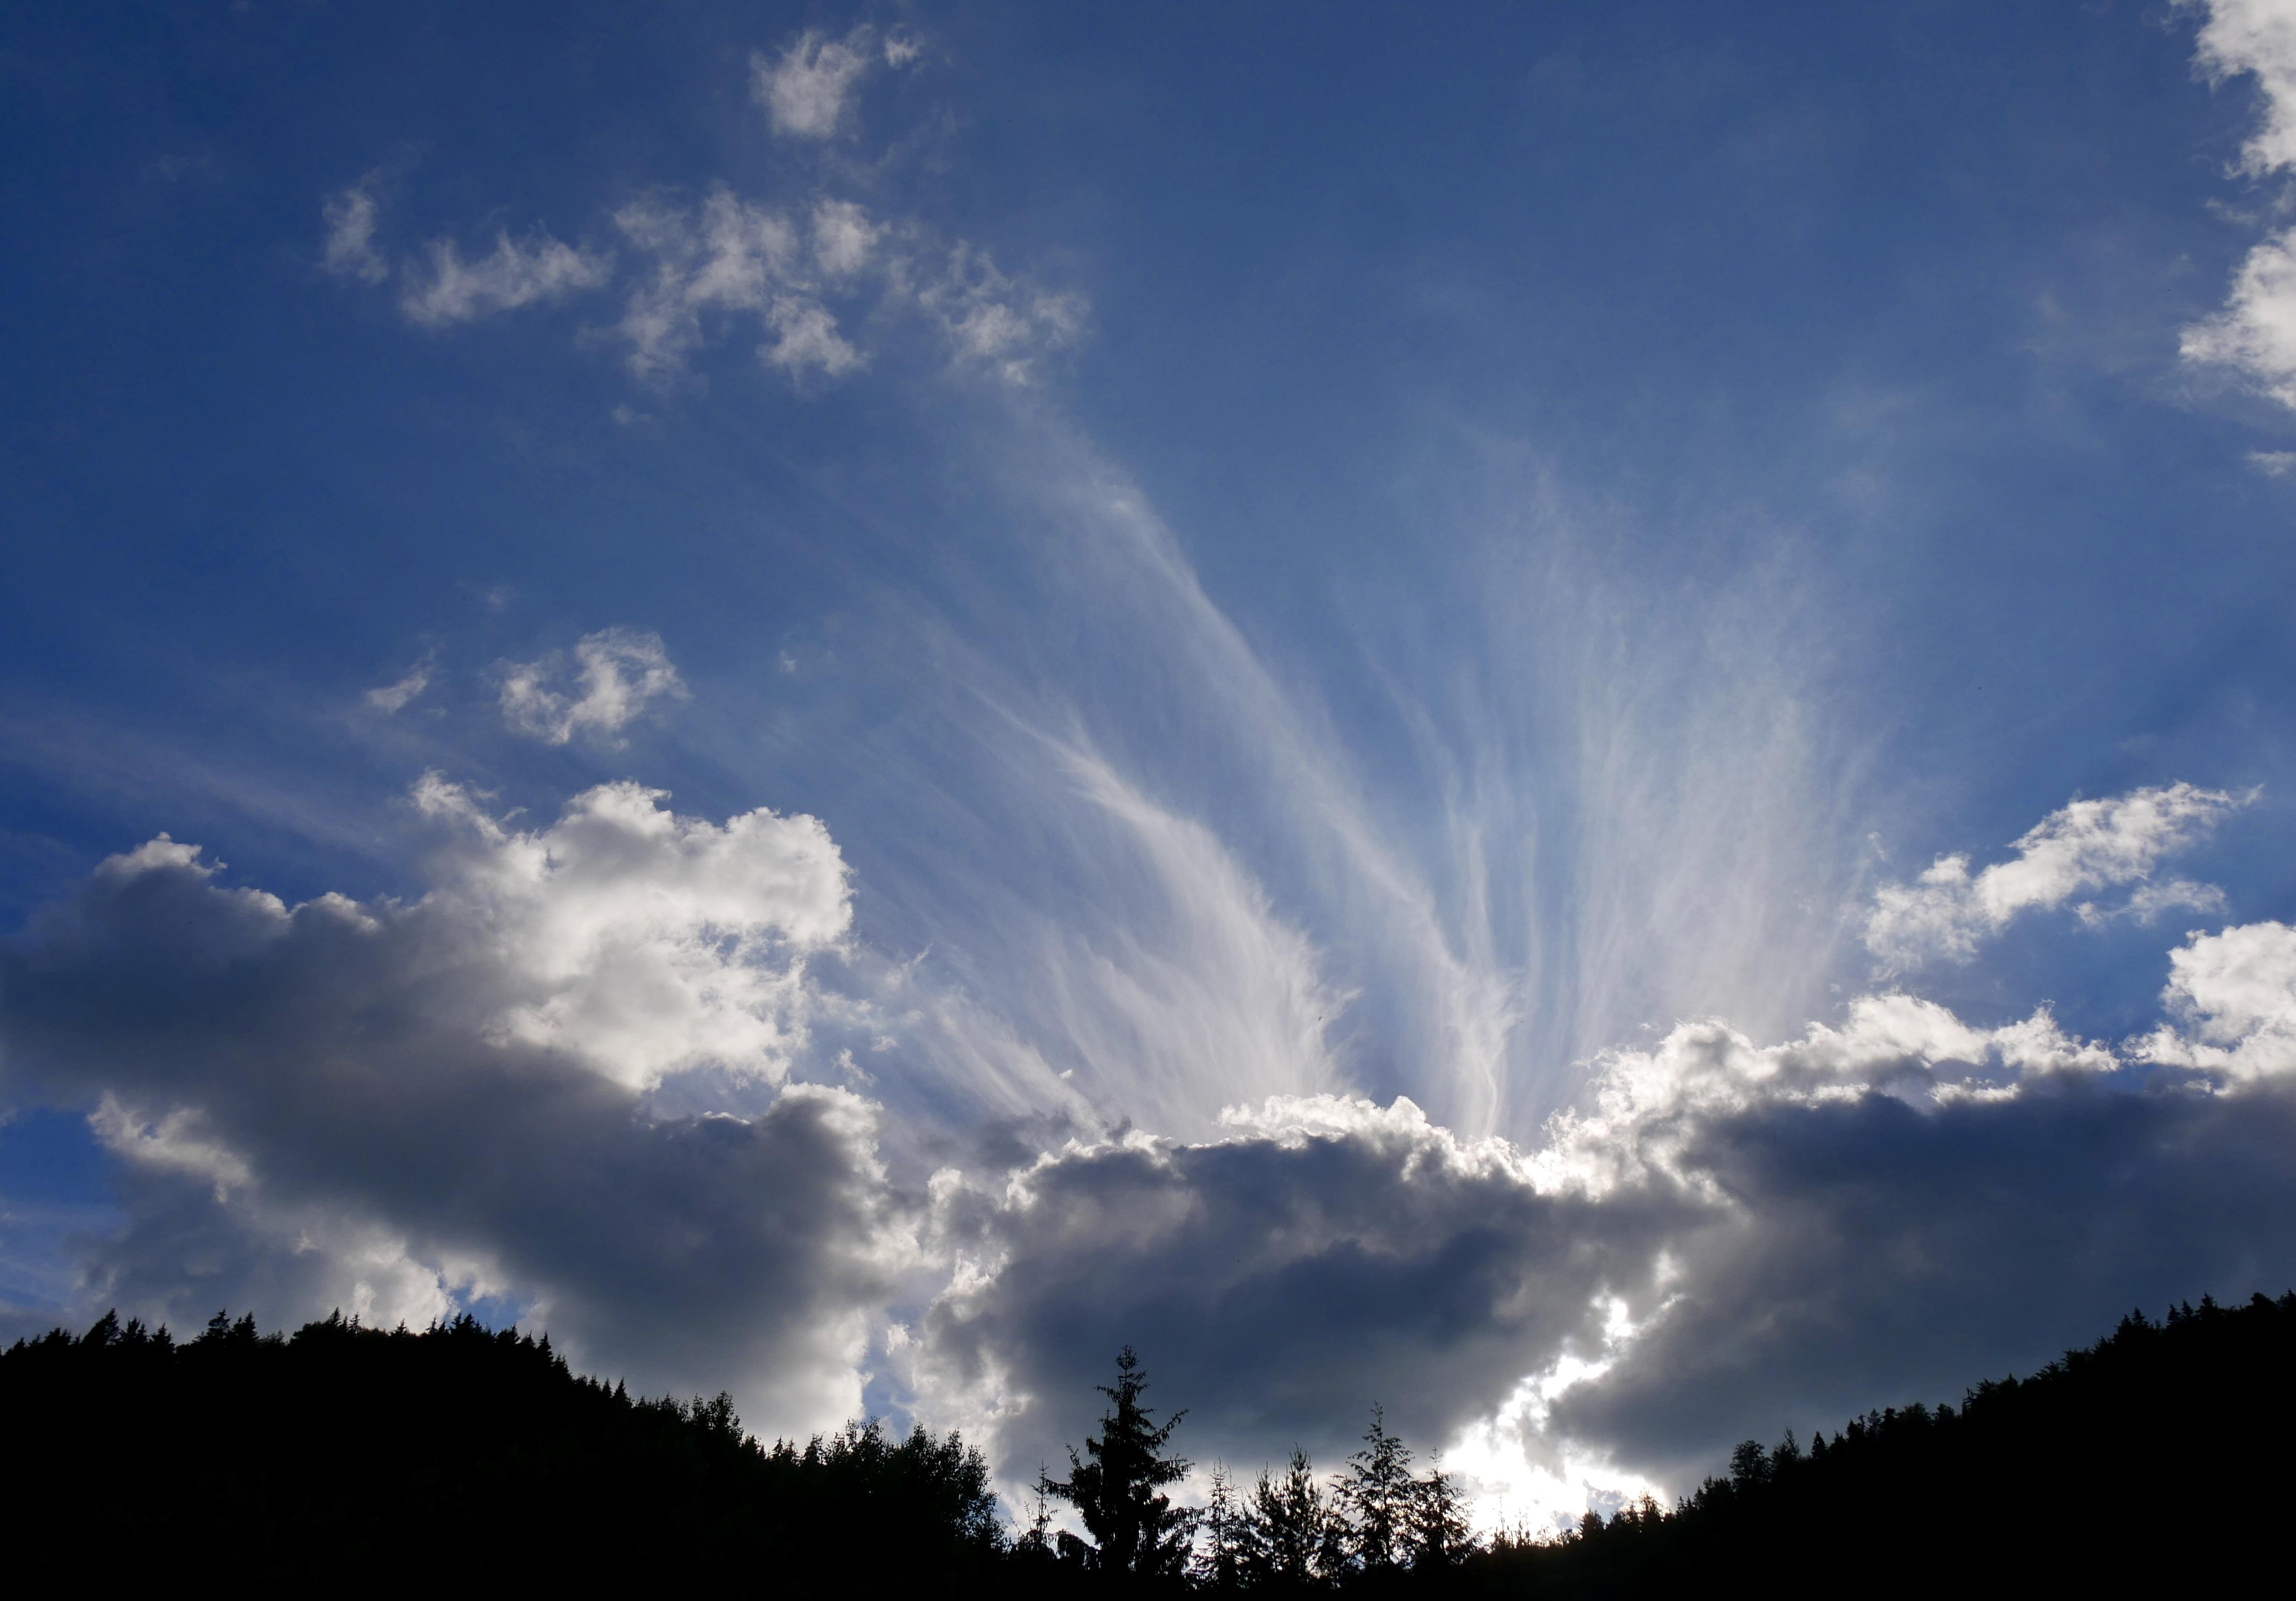 Wolken (copyright Monika Hildebrandt churchphoto.de) - ID 29008